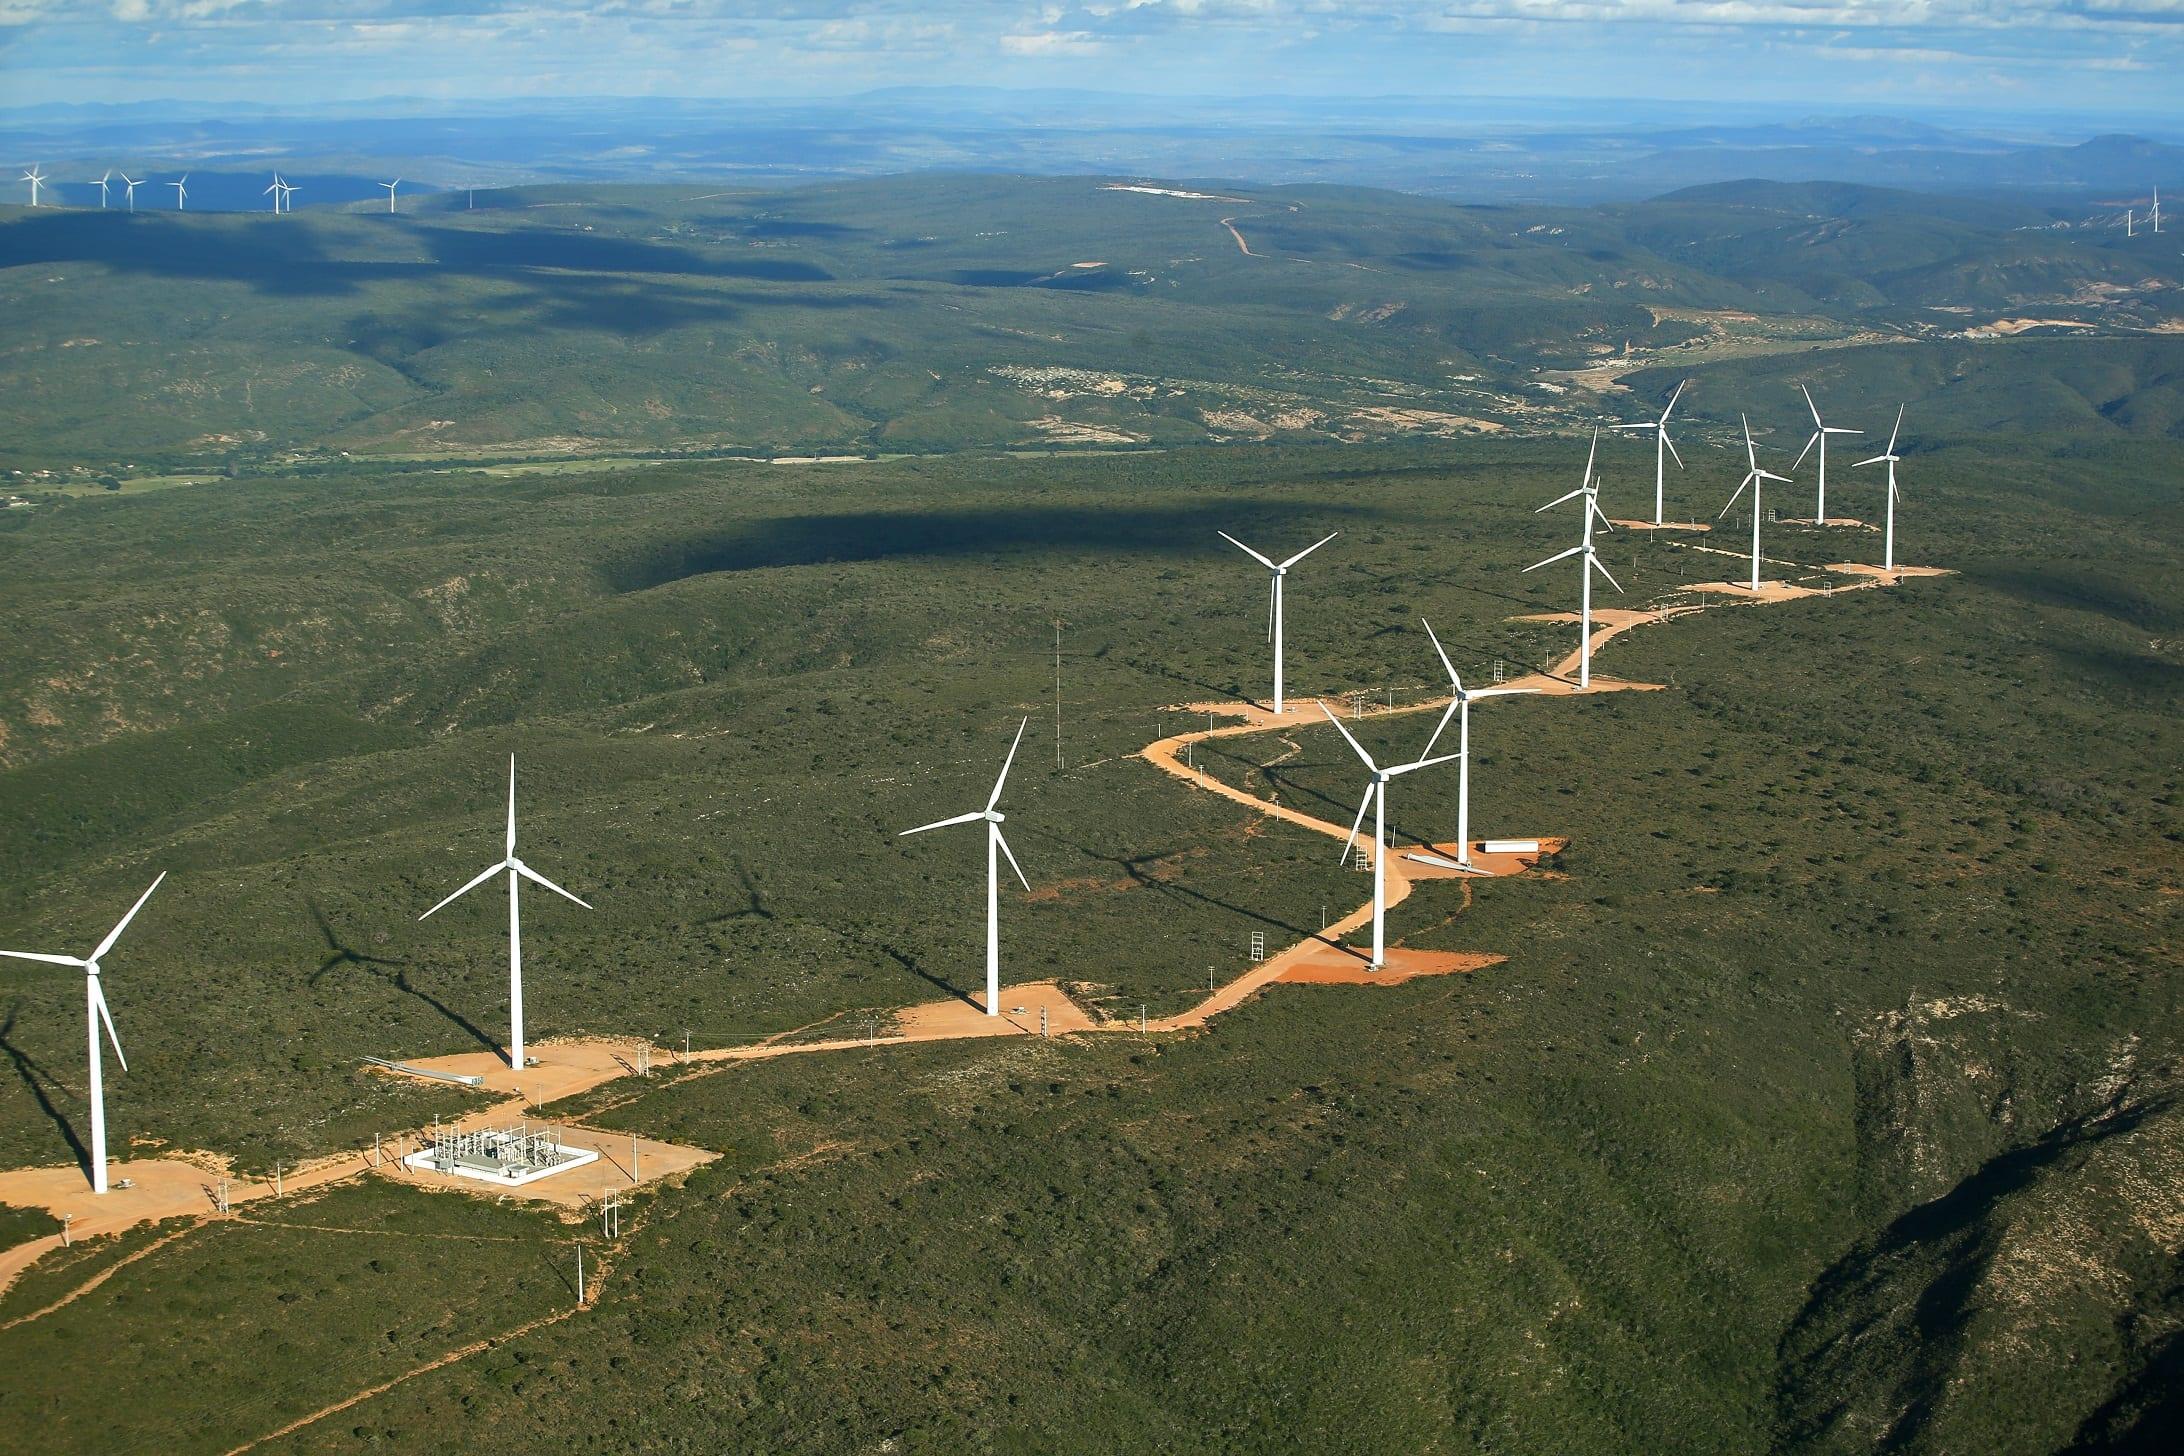 Parque eólico – Rio Grande do Norte